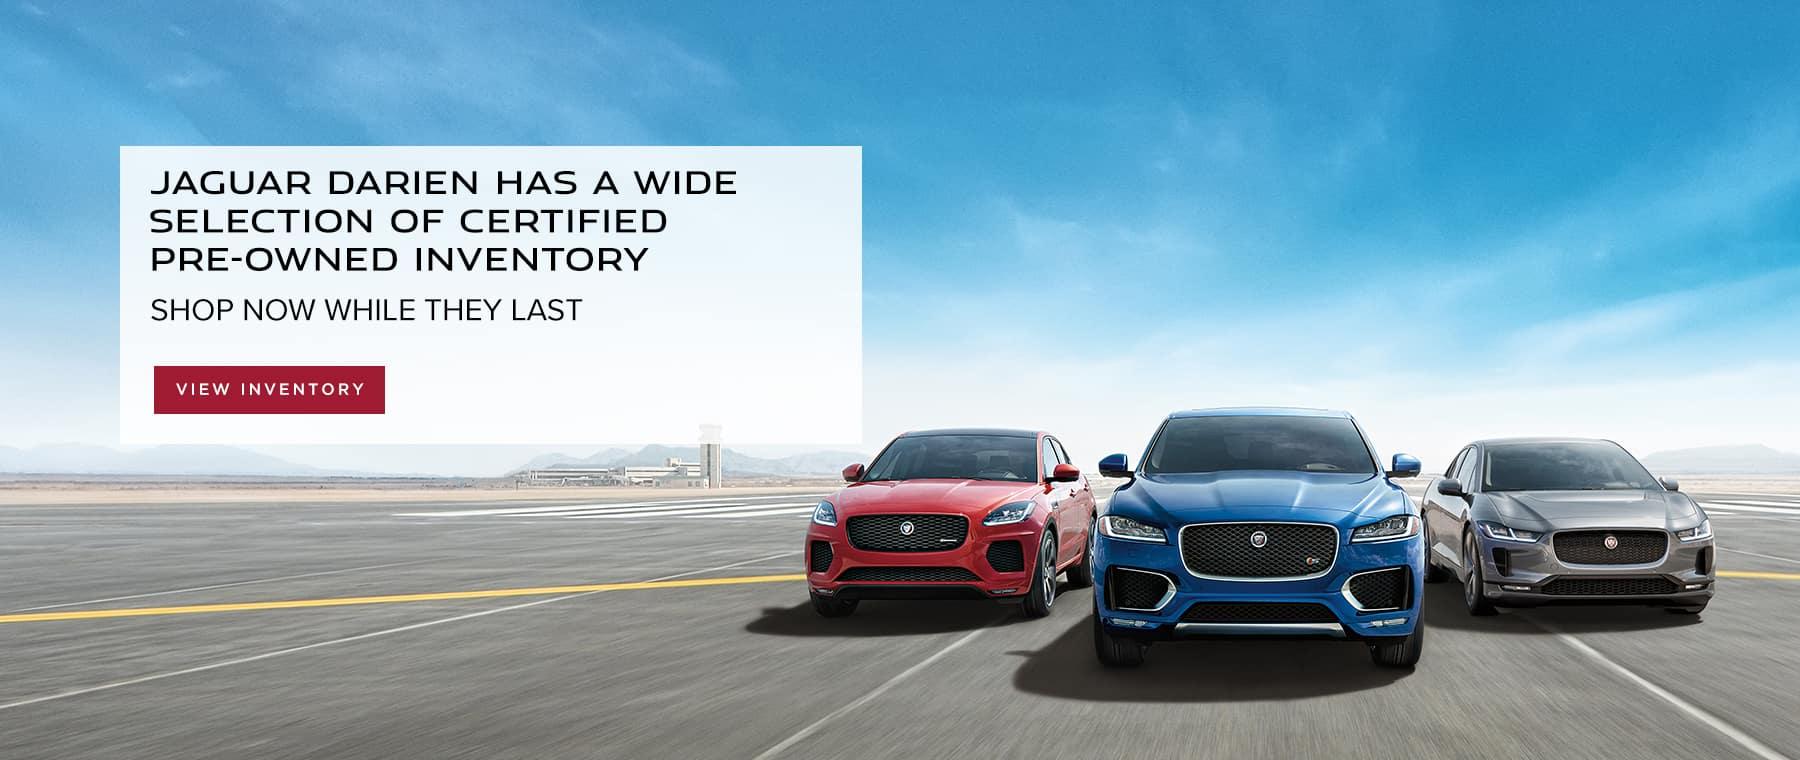 Shop Jaguar Darien's selection of certified pre-owned inventory